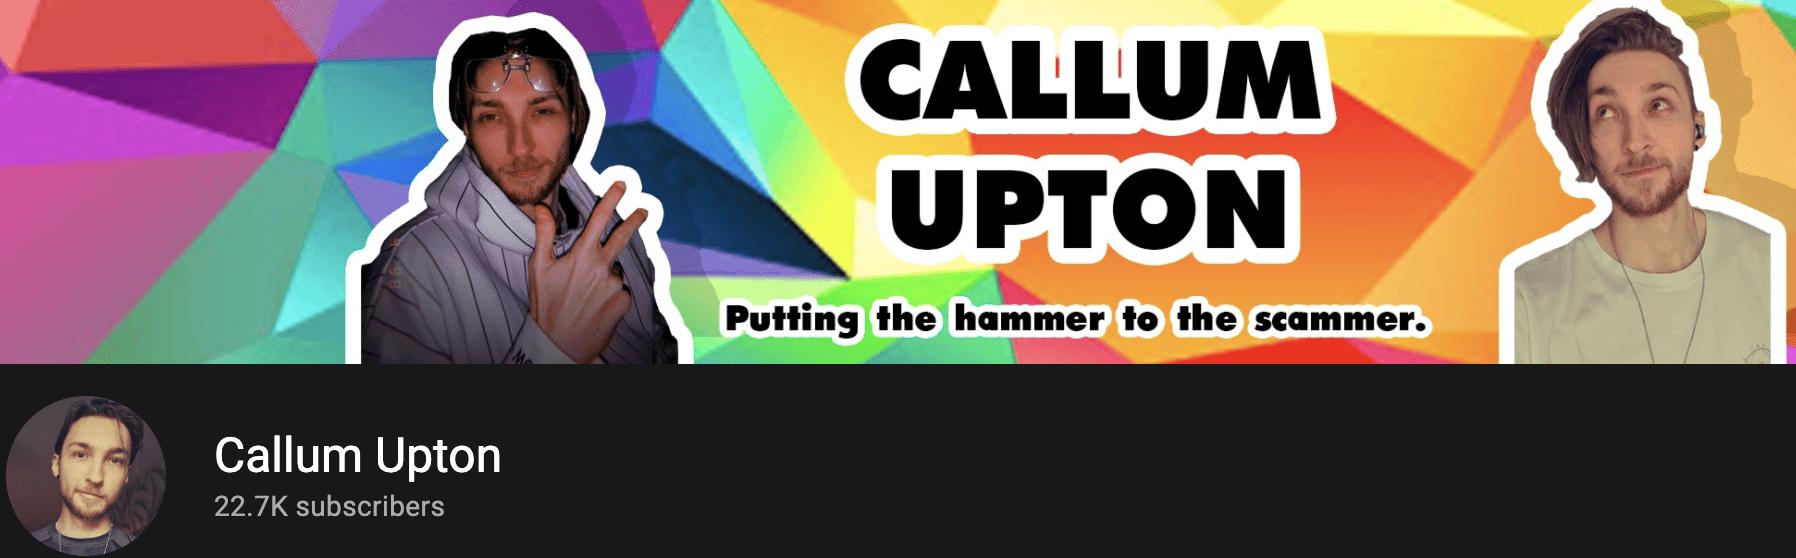 Callum Upton Banner on YouTube